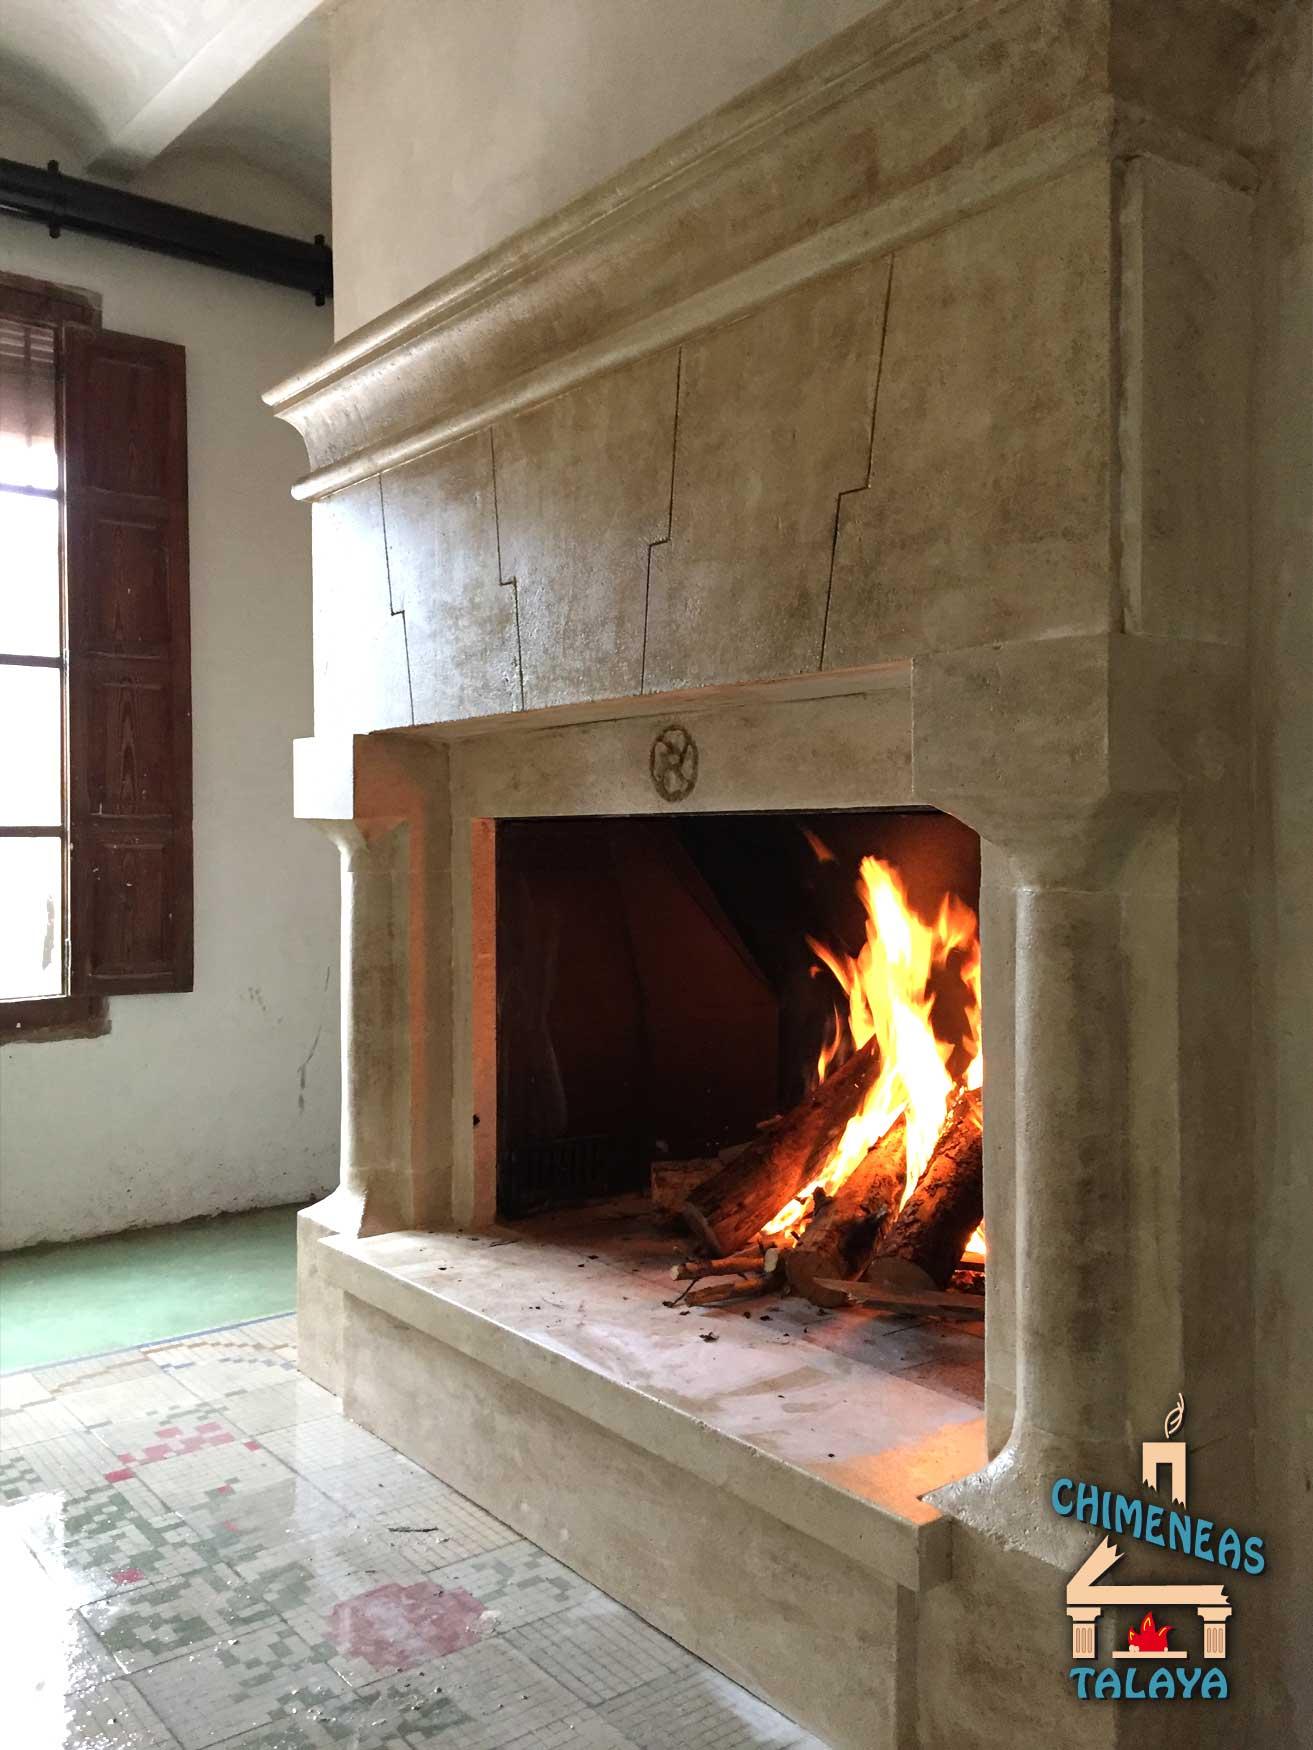 Chimeneas abiertas Sistemas de calefaccin Biomasa Chimeneas Talaya